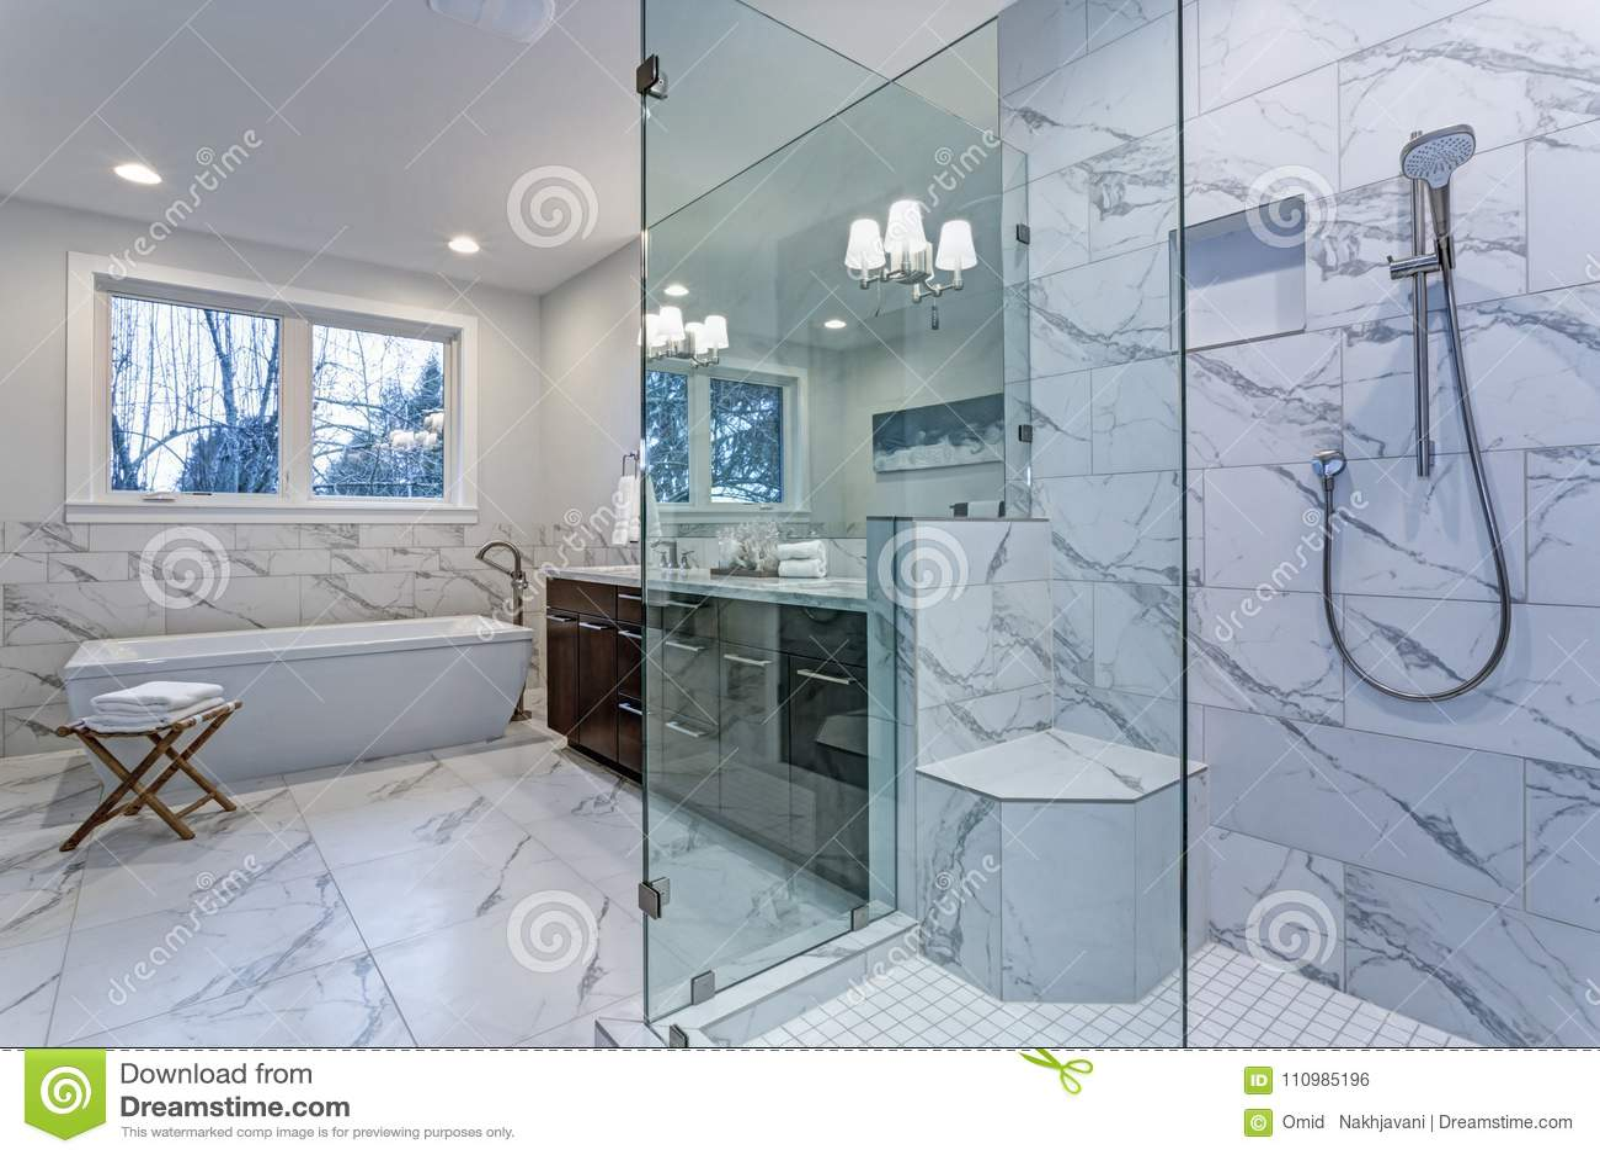 Salle De Bain Marbre De Carrare salle de bains principale incroyable avec la bordure de